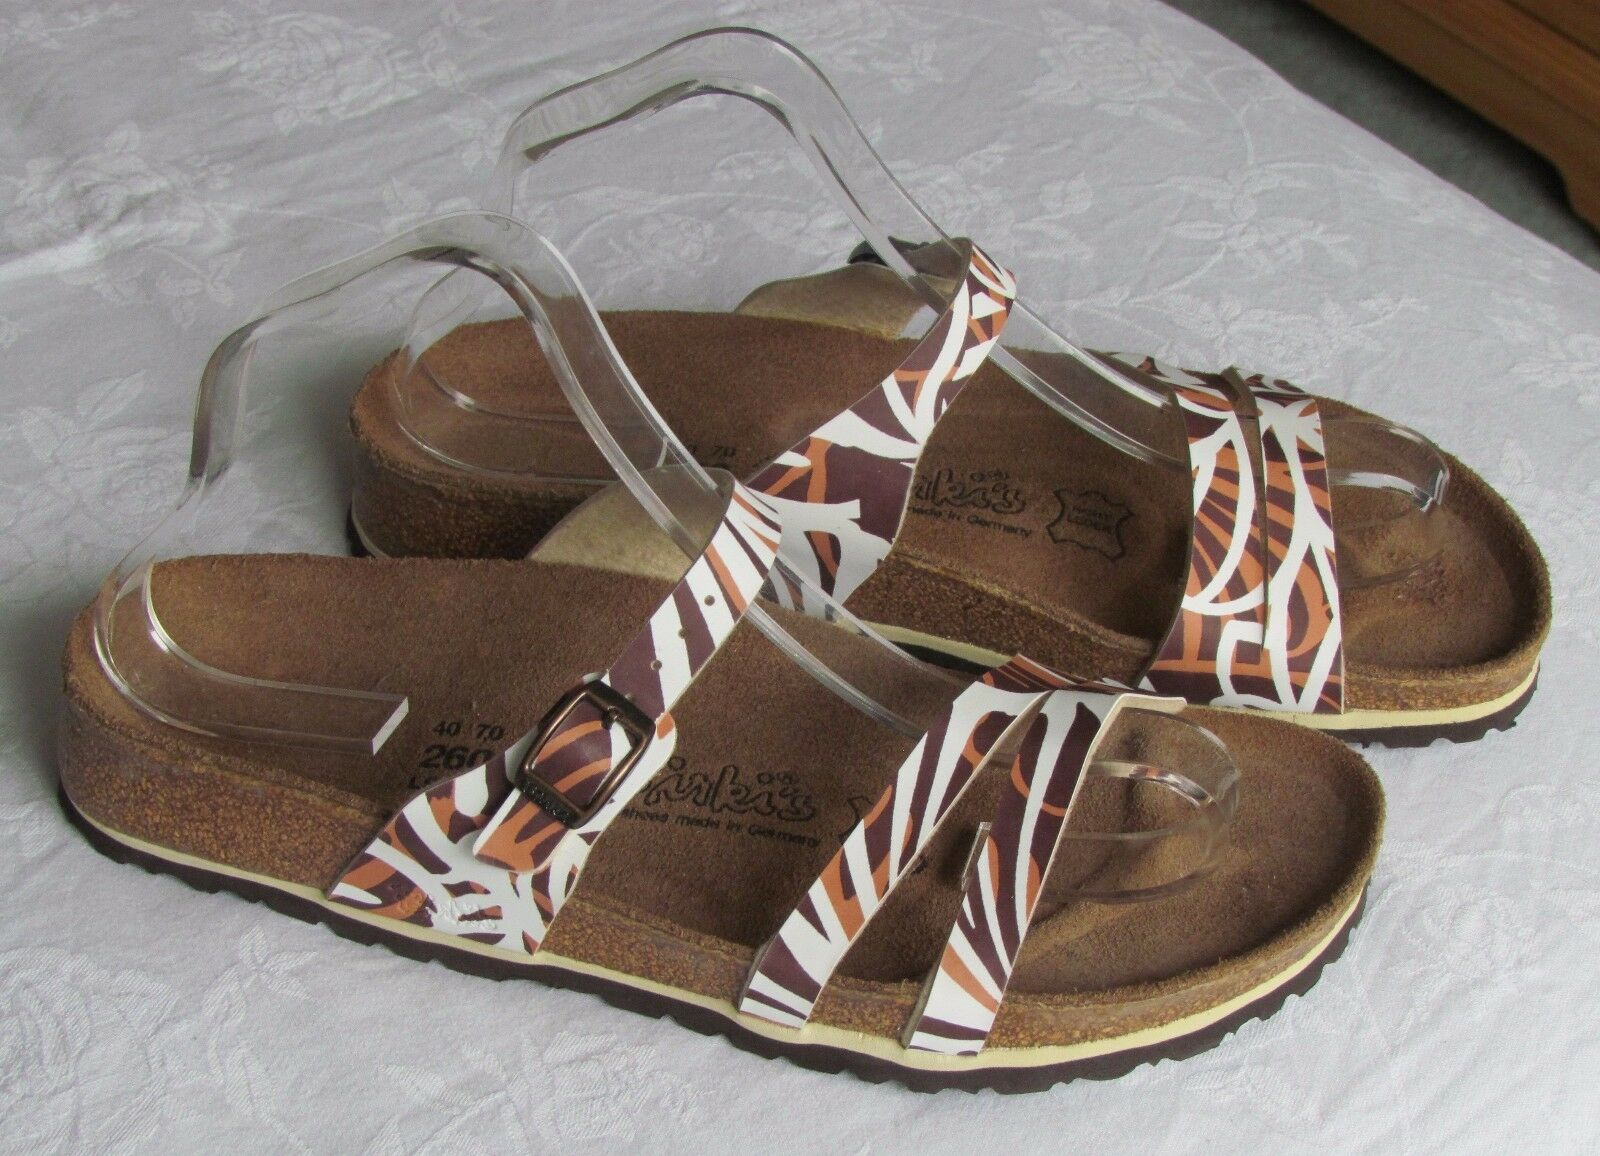 Nuevo Birkis by Birkenstock Damas Safari Marrón Tostado Mulas Sandalias UK Size 7